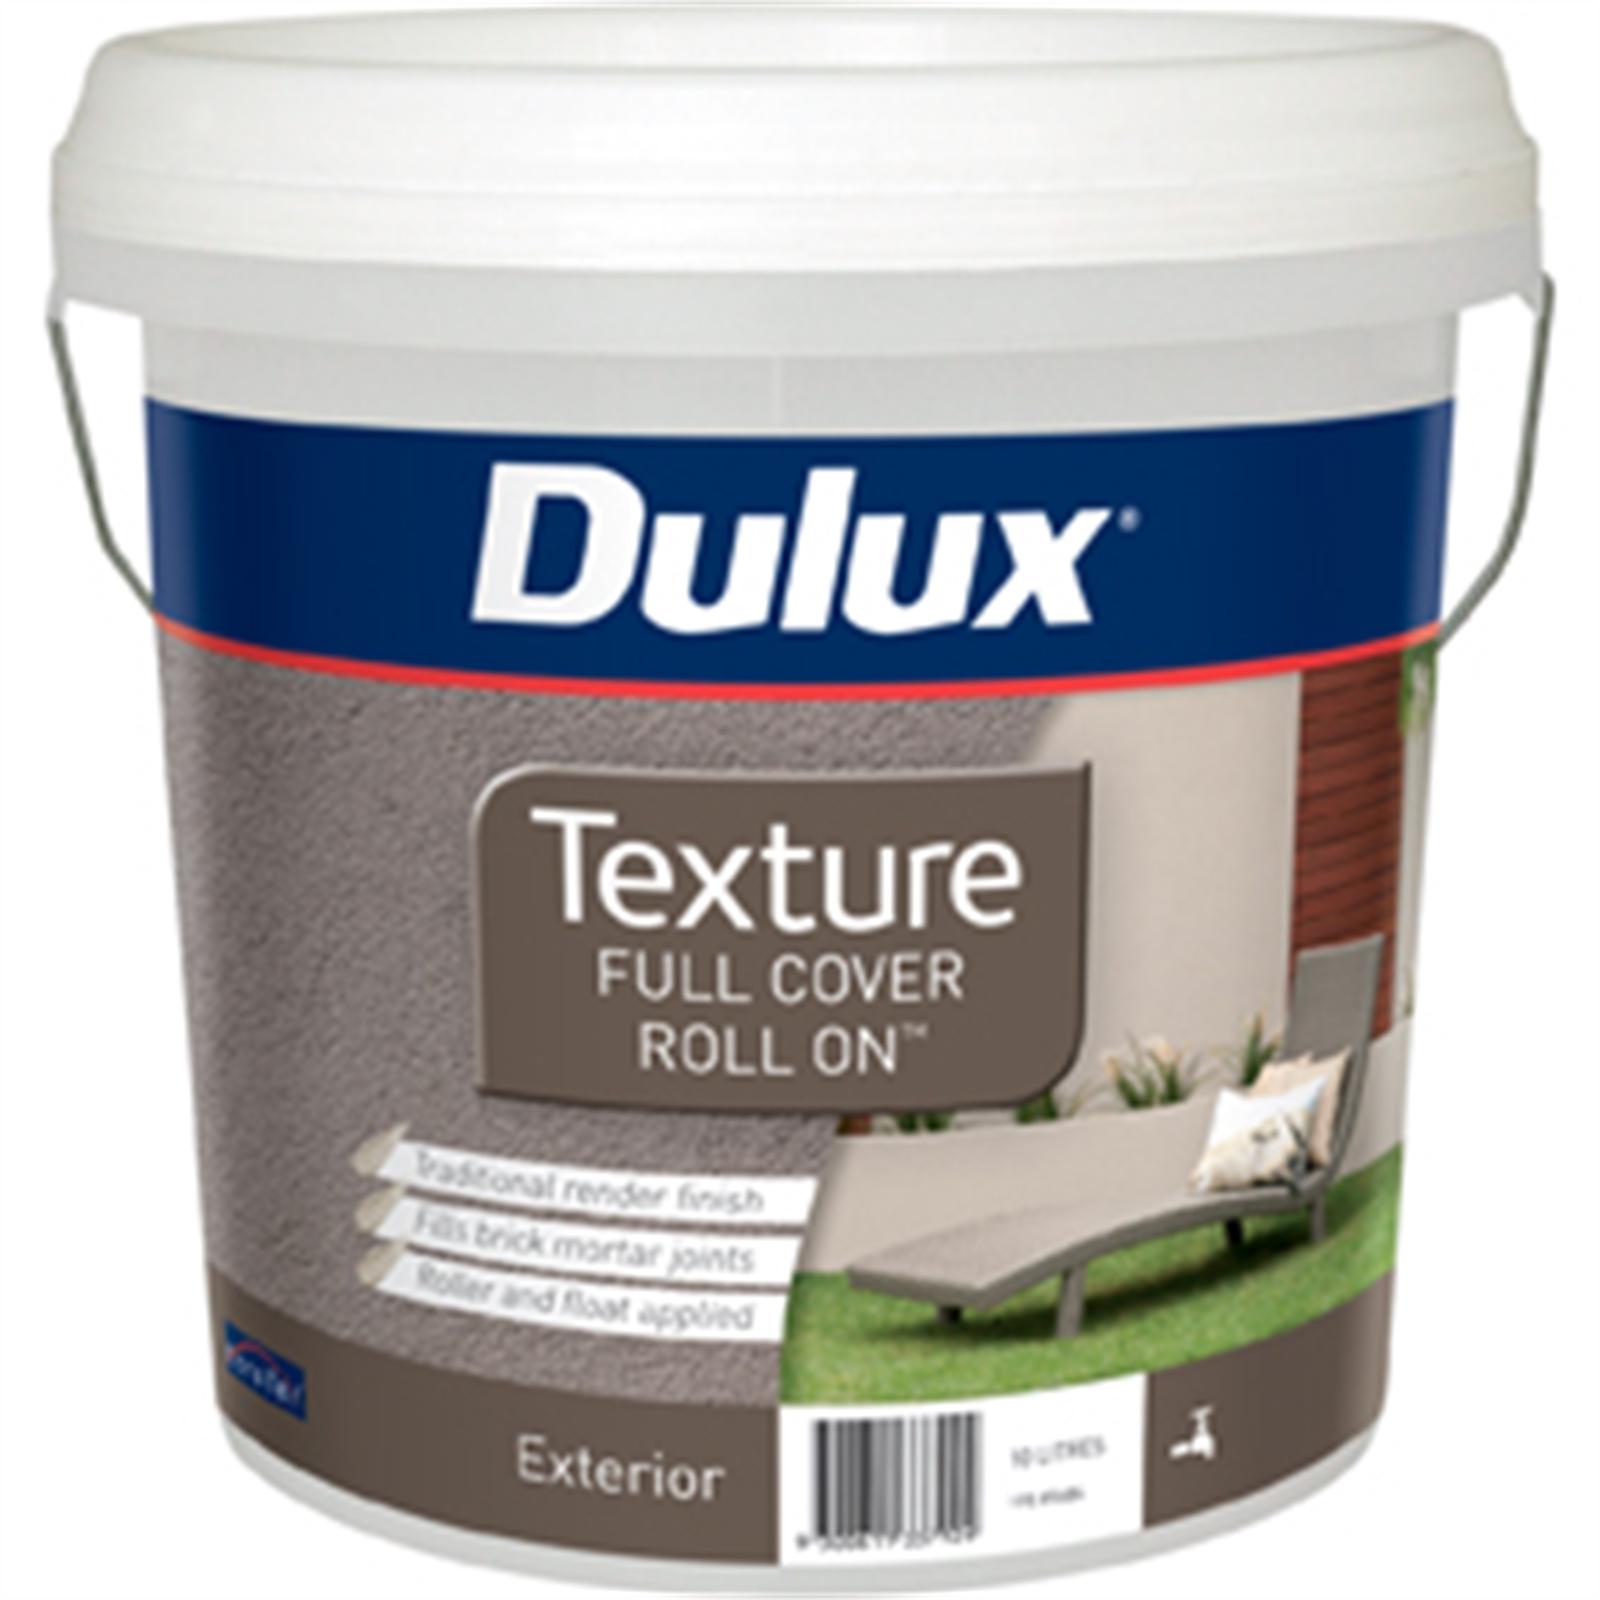 Dulux 10L Texture Full Cover Exterior Paint